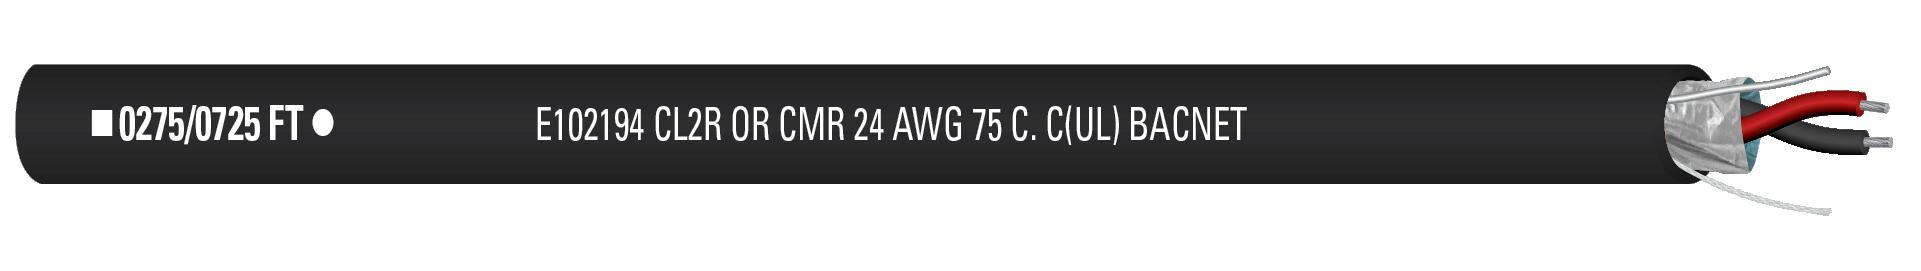 24-1P OAS STR CMR LC Blk Jkt